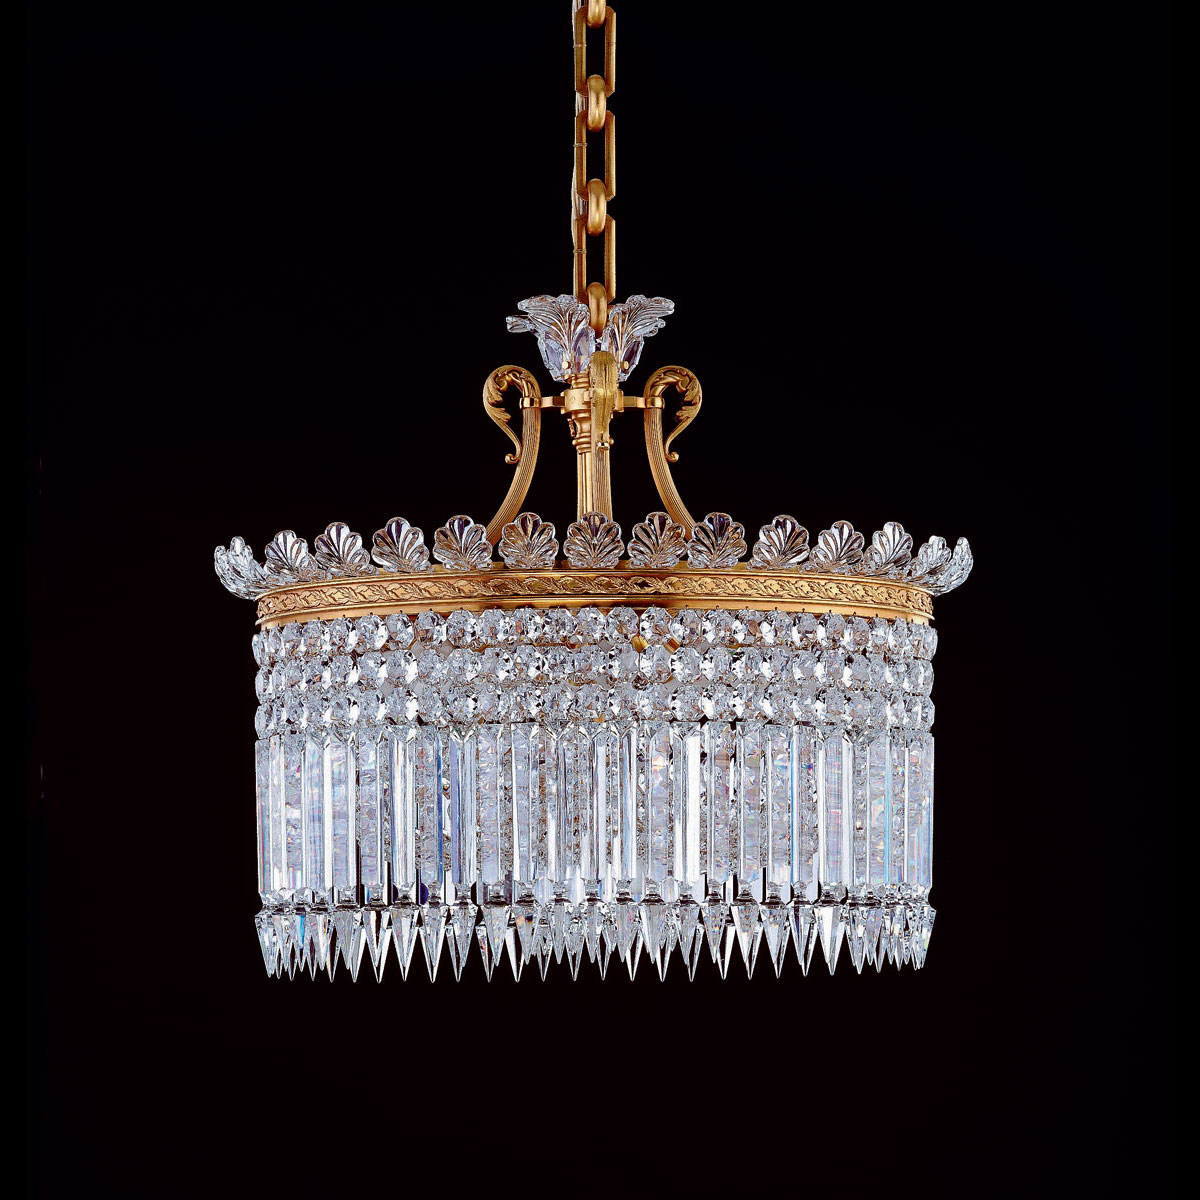 Baccarat Crystal Crinoline Chandelier, 13 Light